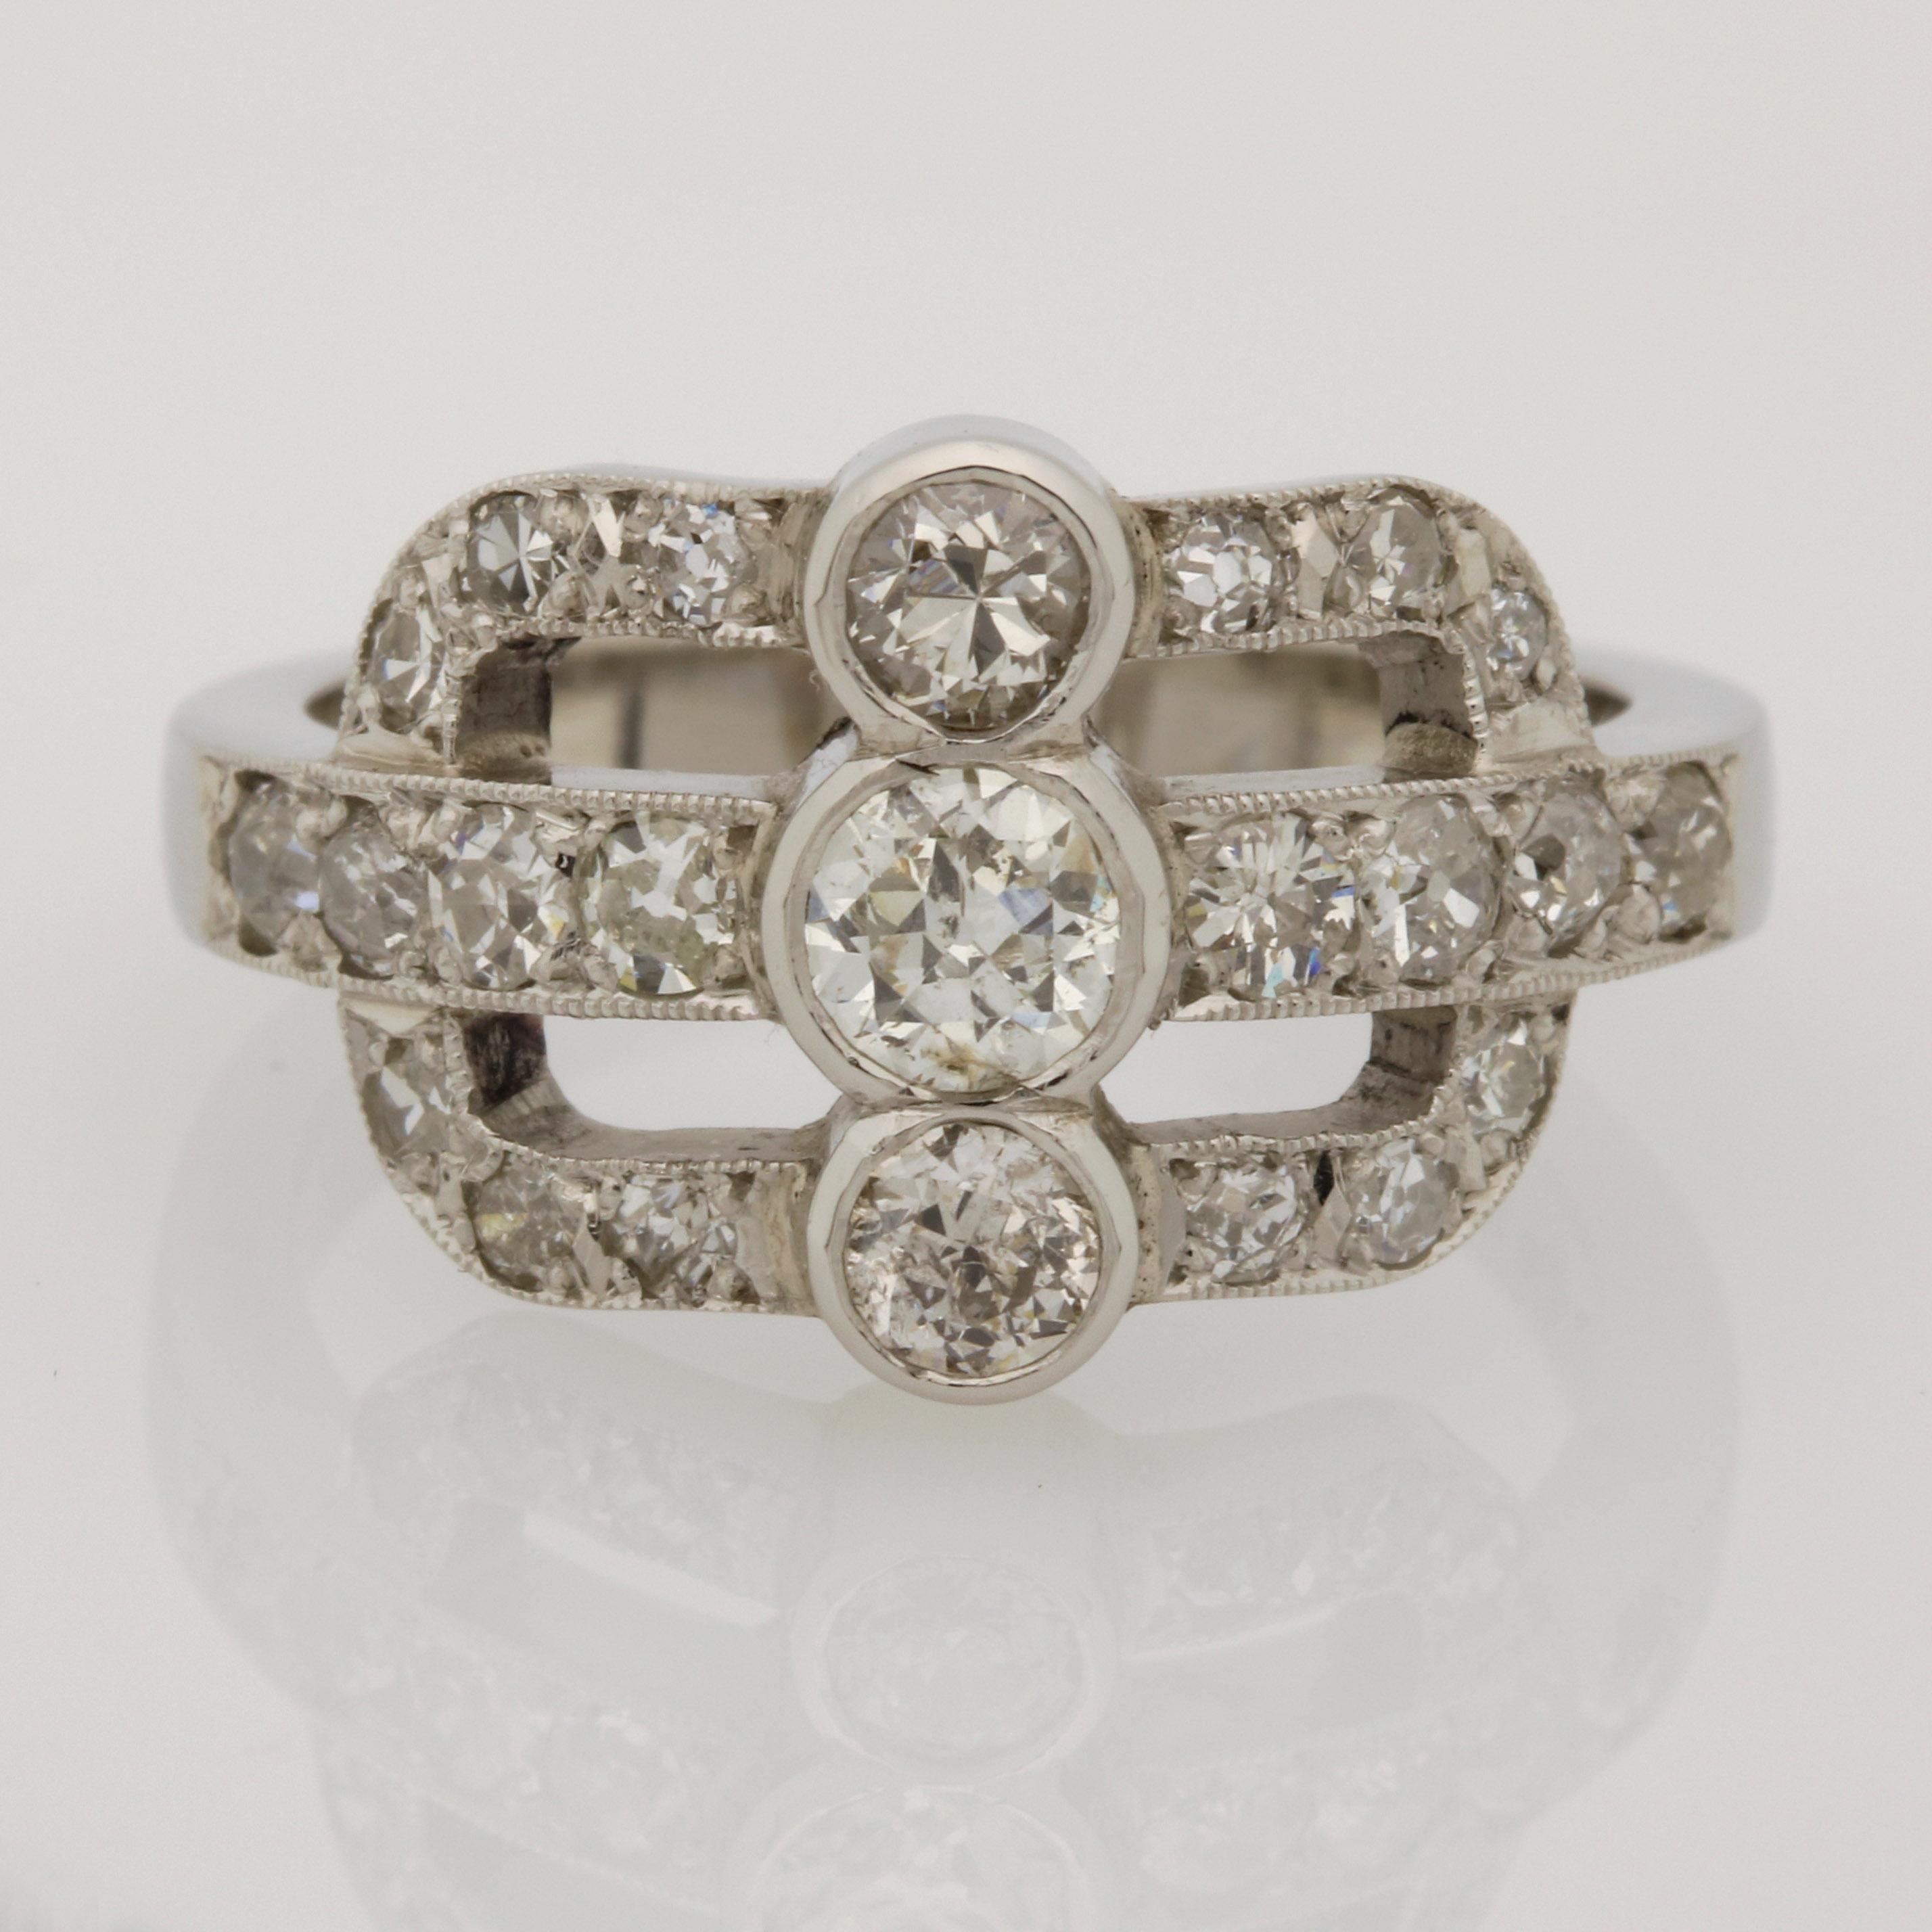 Ladies handmade palladium and diamond ring